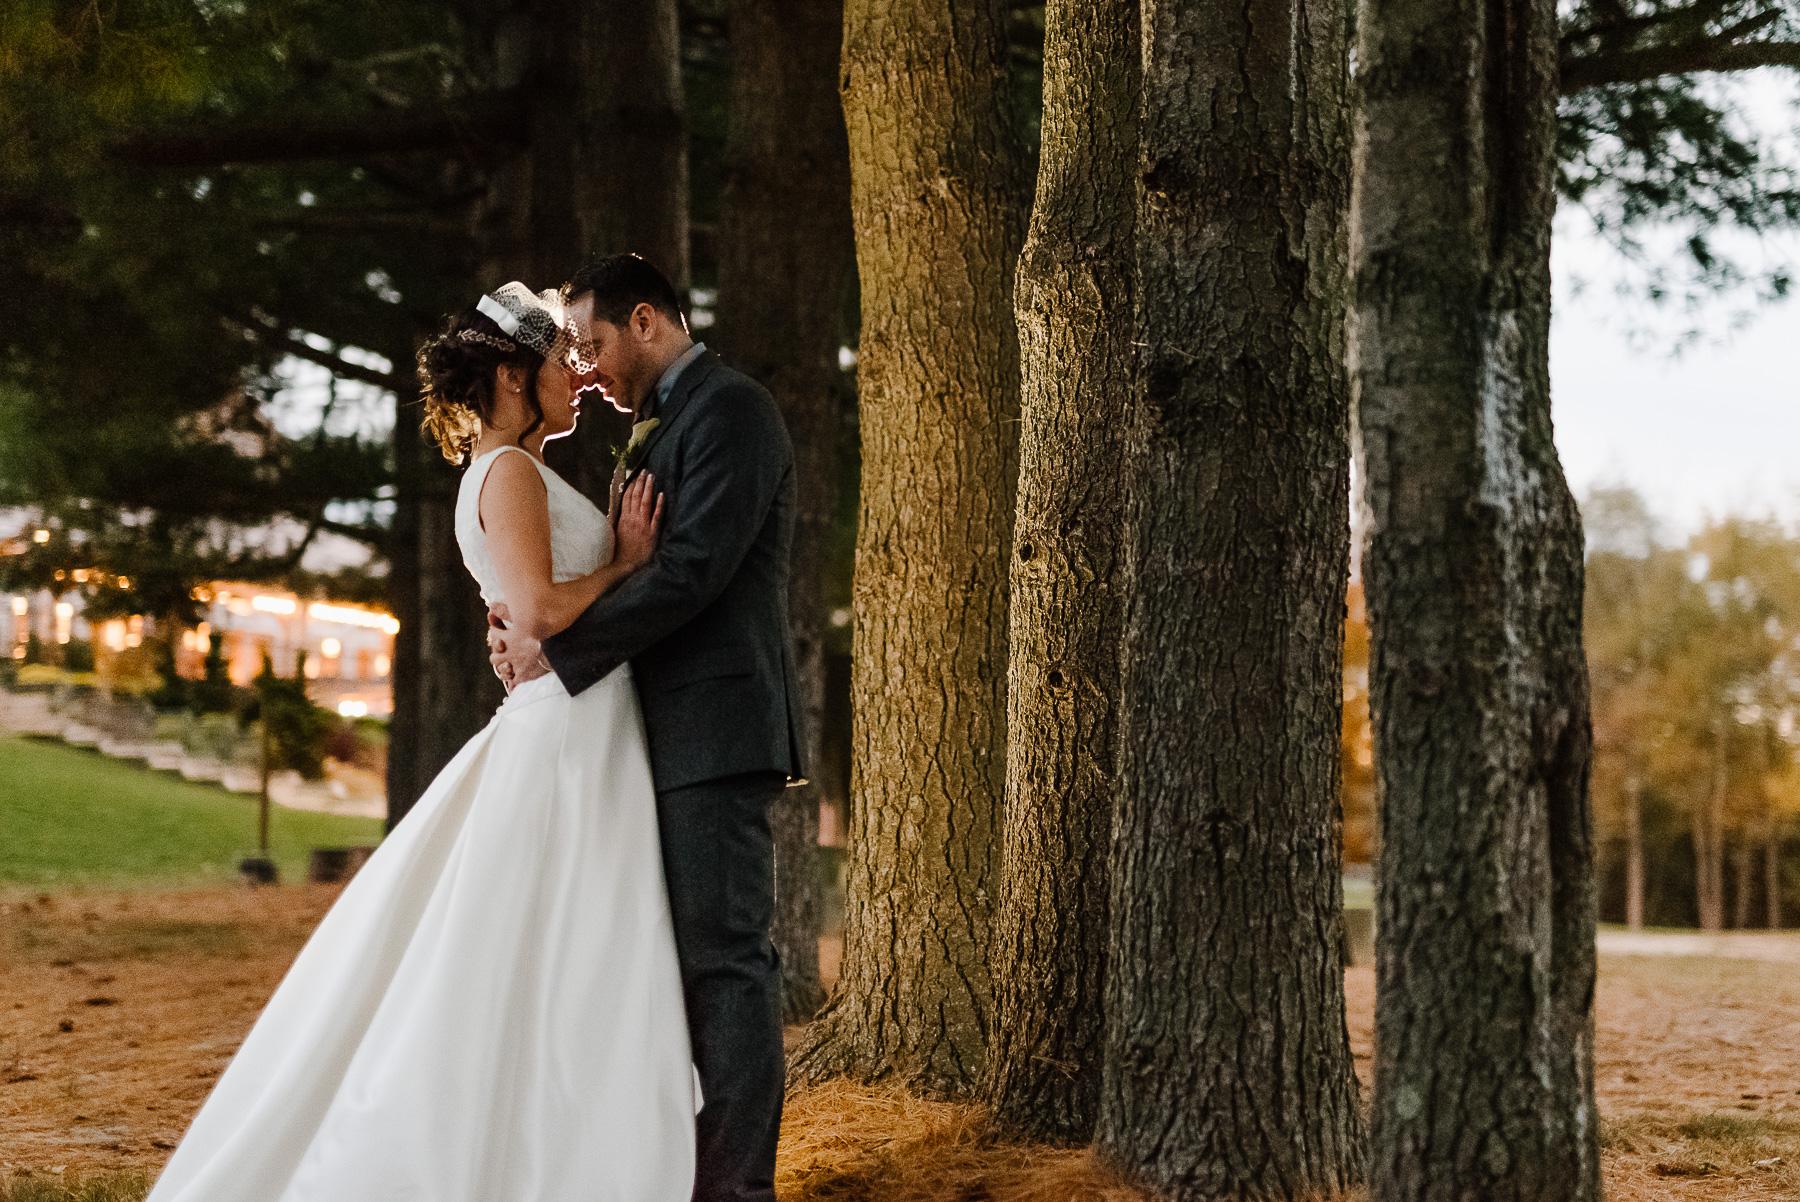 93-Laurita Winery Wedding New Jersey Wedding Photographer Laurita Winery Weddings Longbrook Photography.jpg